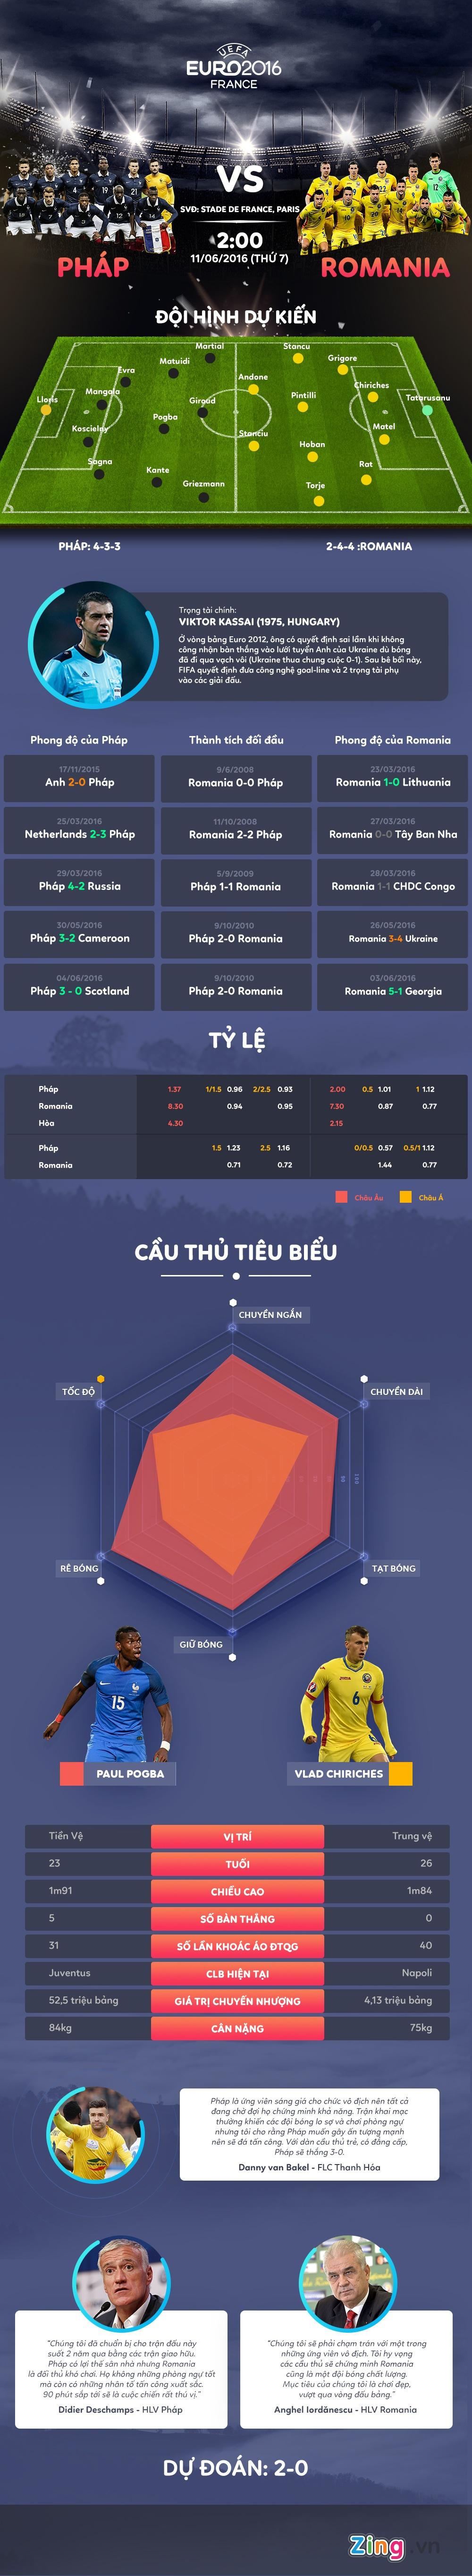 Khai mac Euro 2016 Phap vs Romania: Cong cuong gap thu vung hinh anh 1